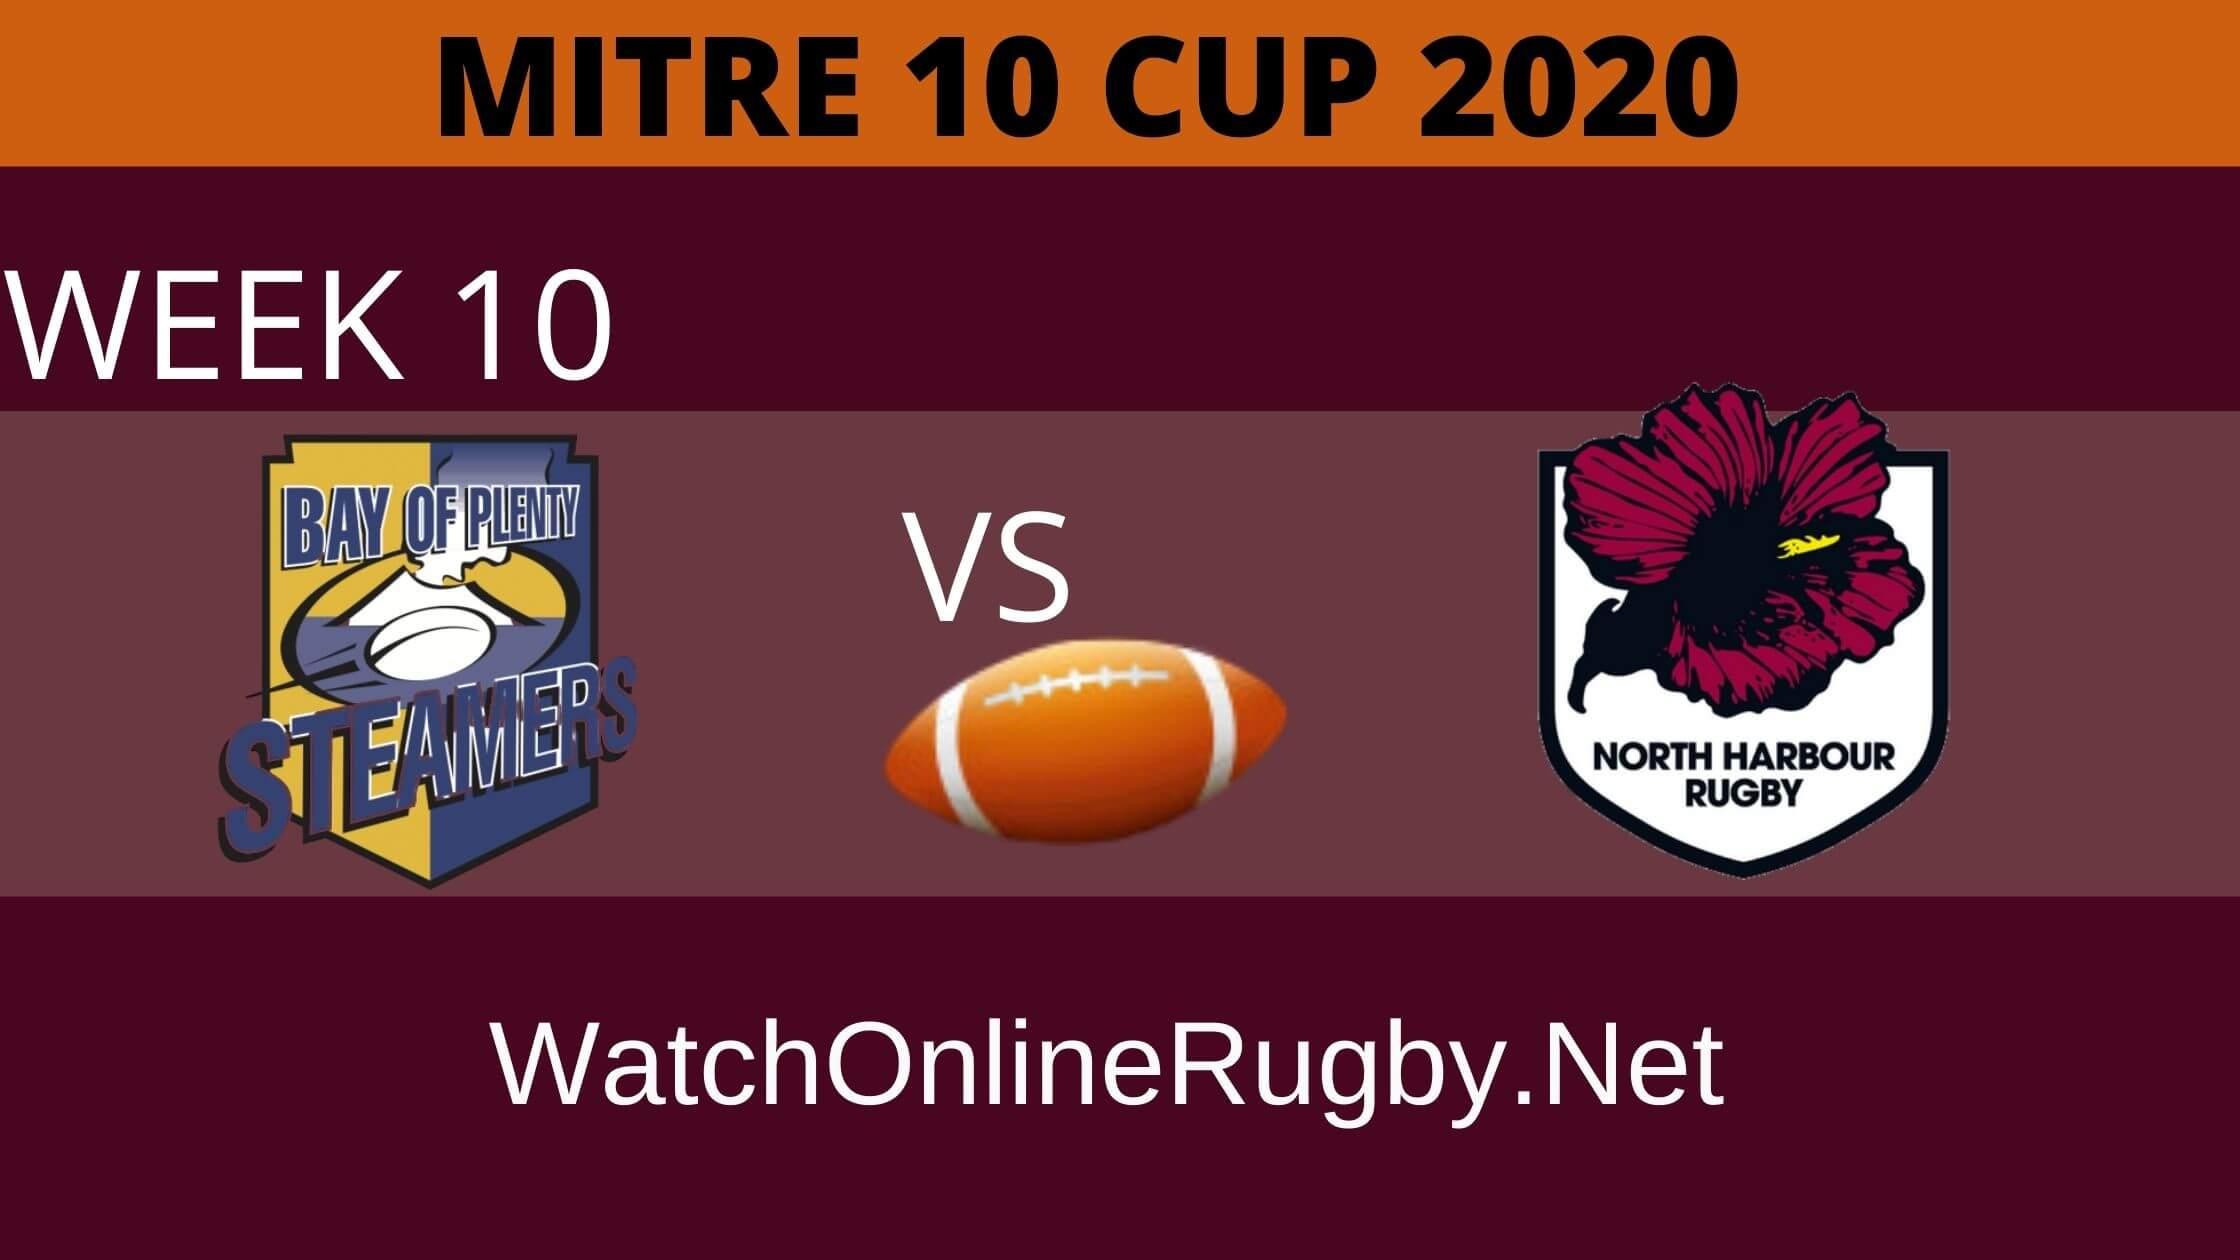 Rugby Bay Of Plenty vs North Harbour Live Online